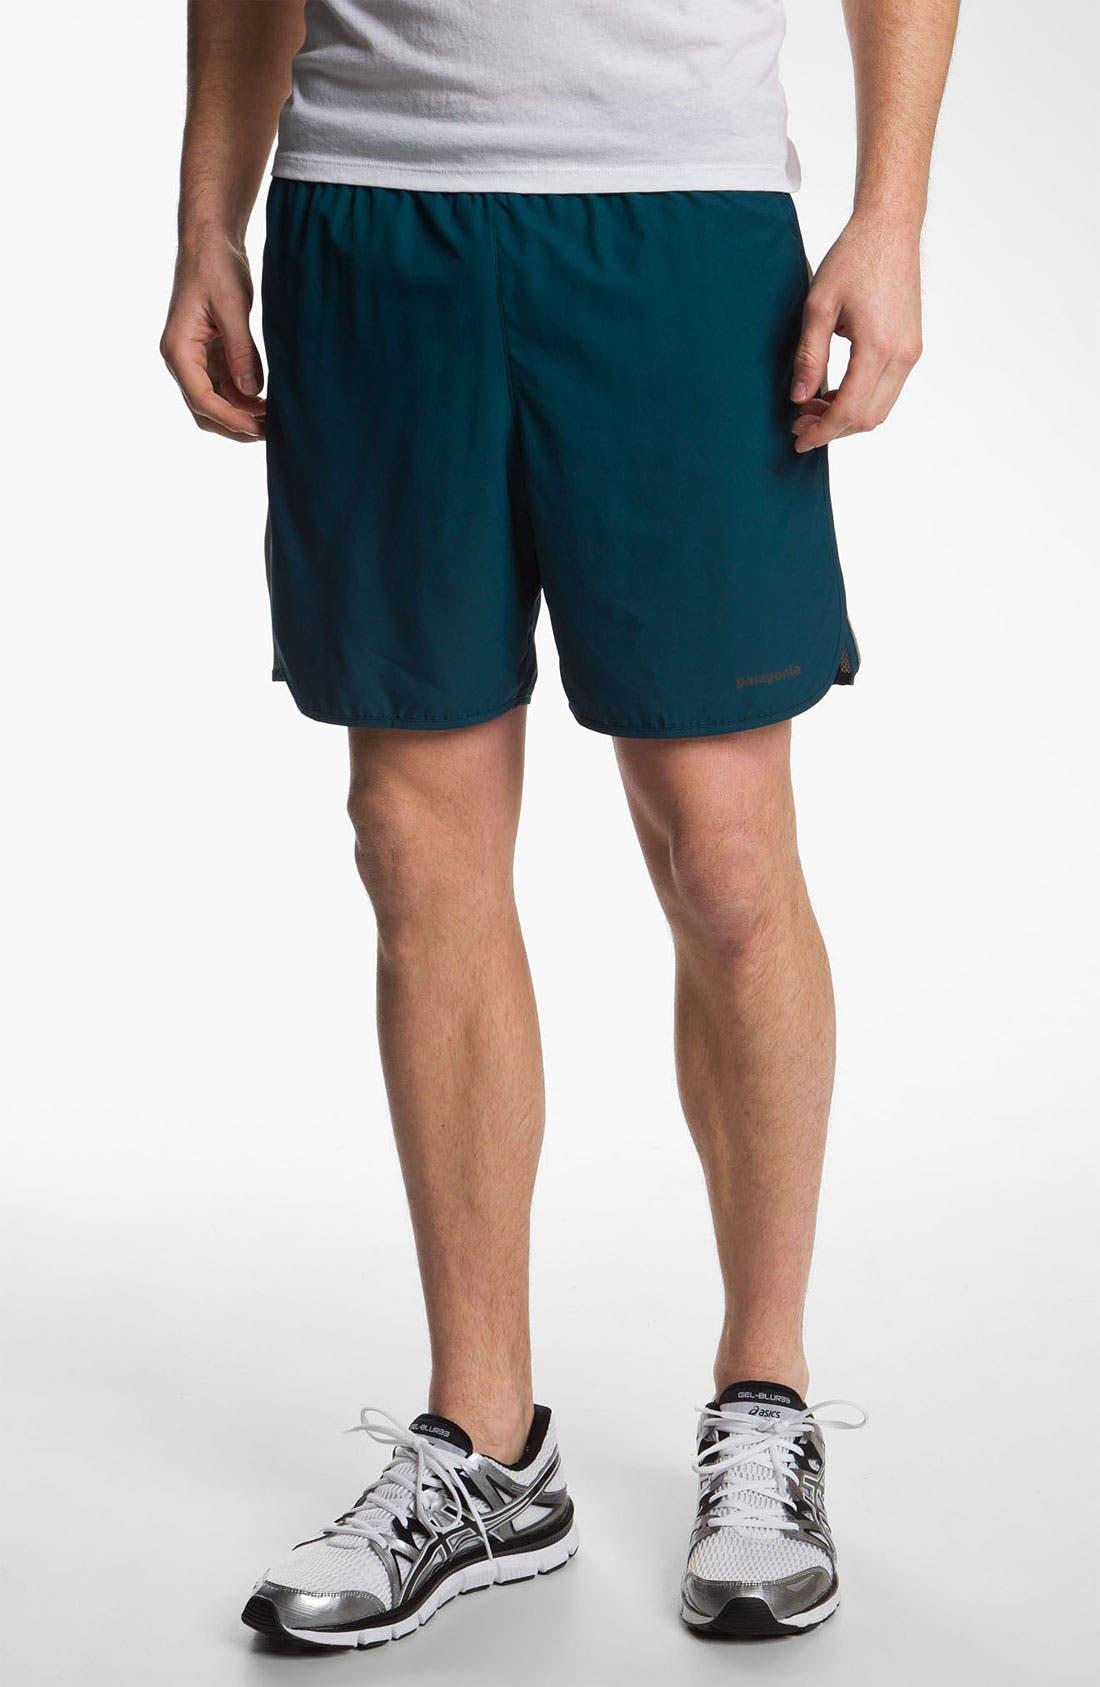 Alternate Image 1 Selected - Patagonia 'Strider' Shorts